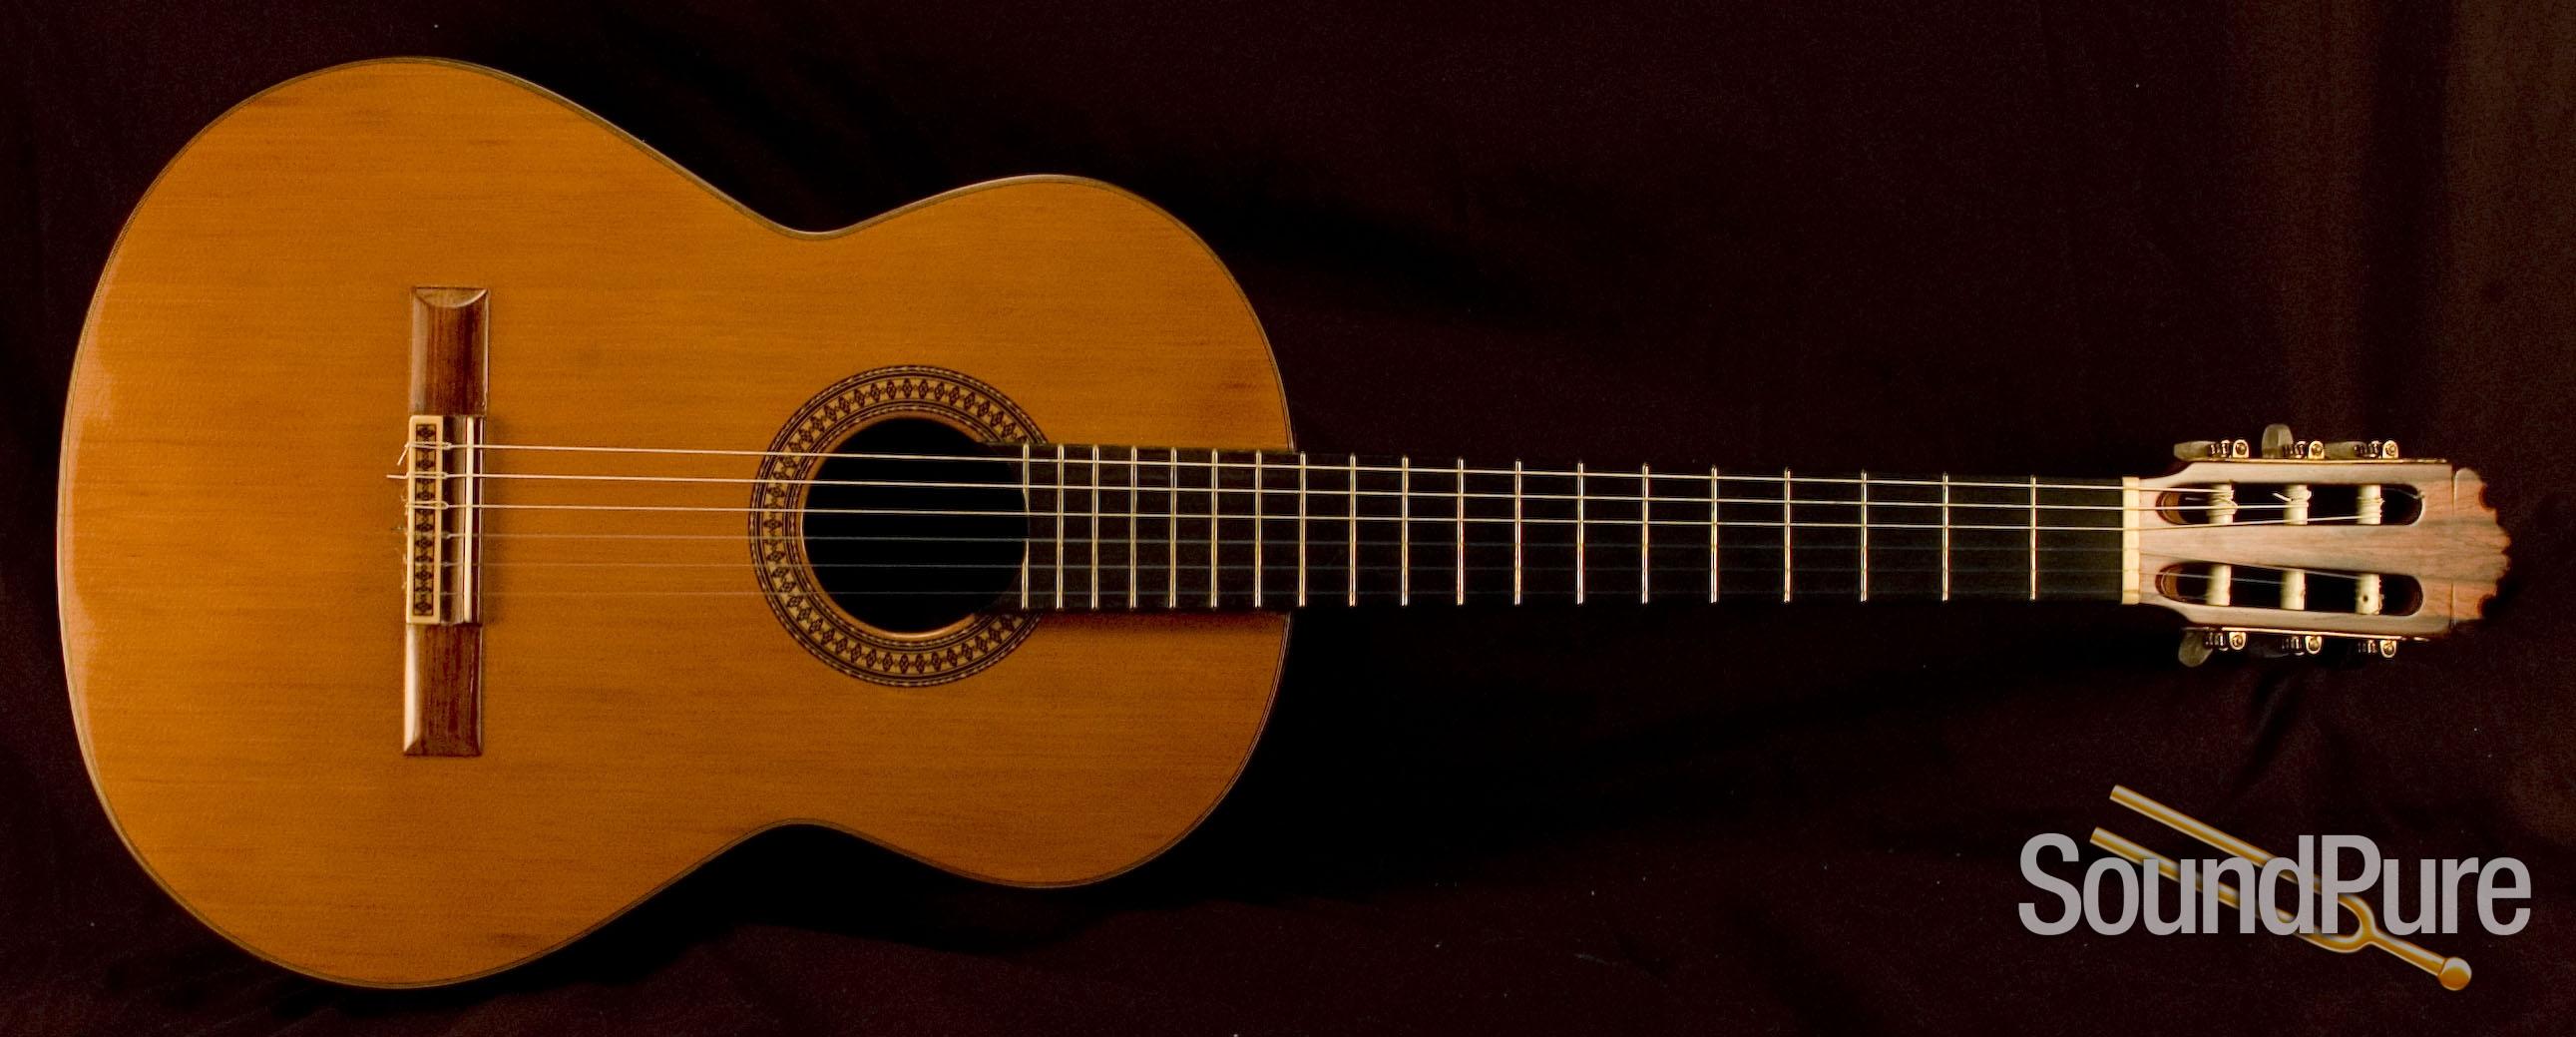 1971 Contreras Concert Classical Guitar Manuel Sr Signed